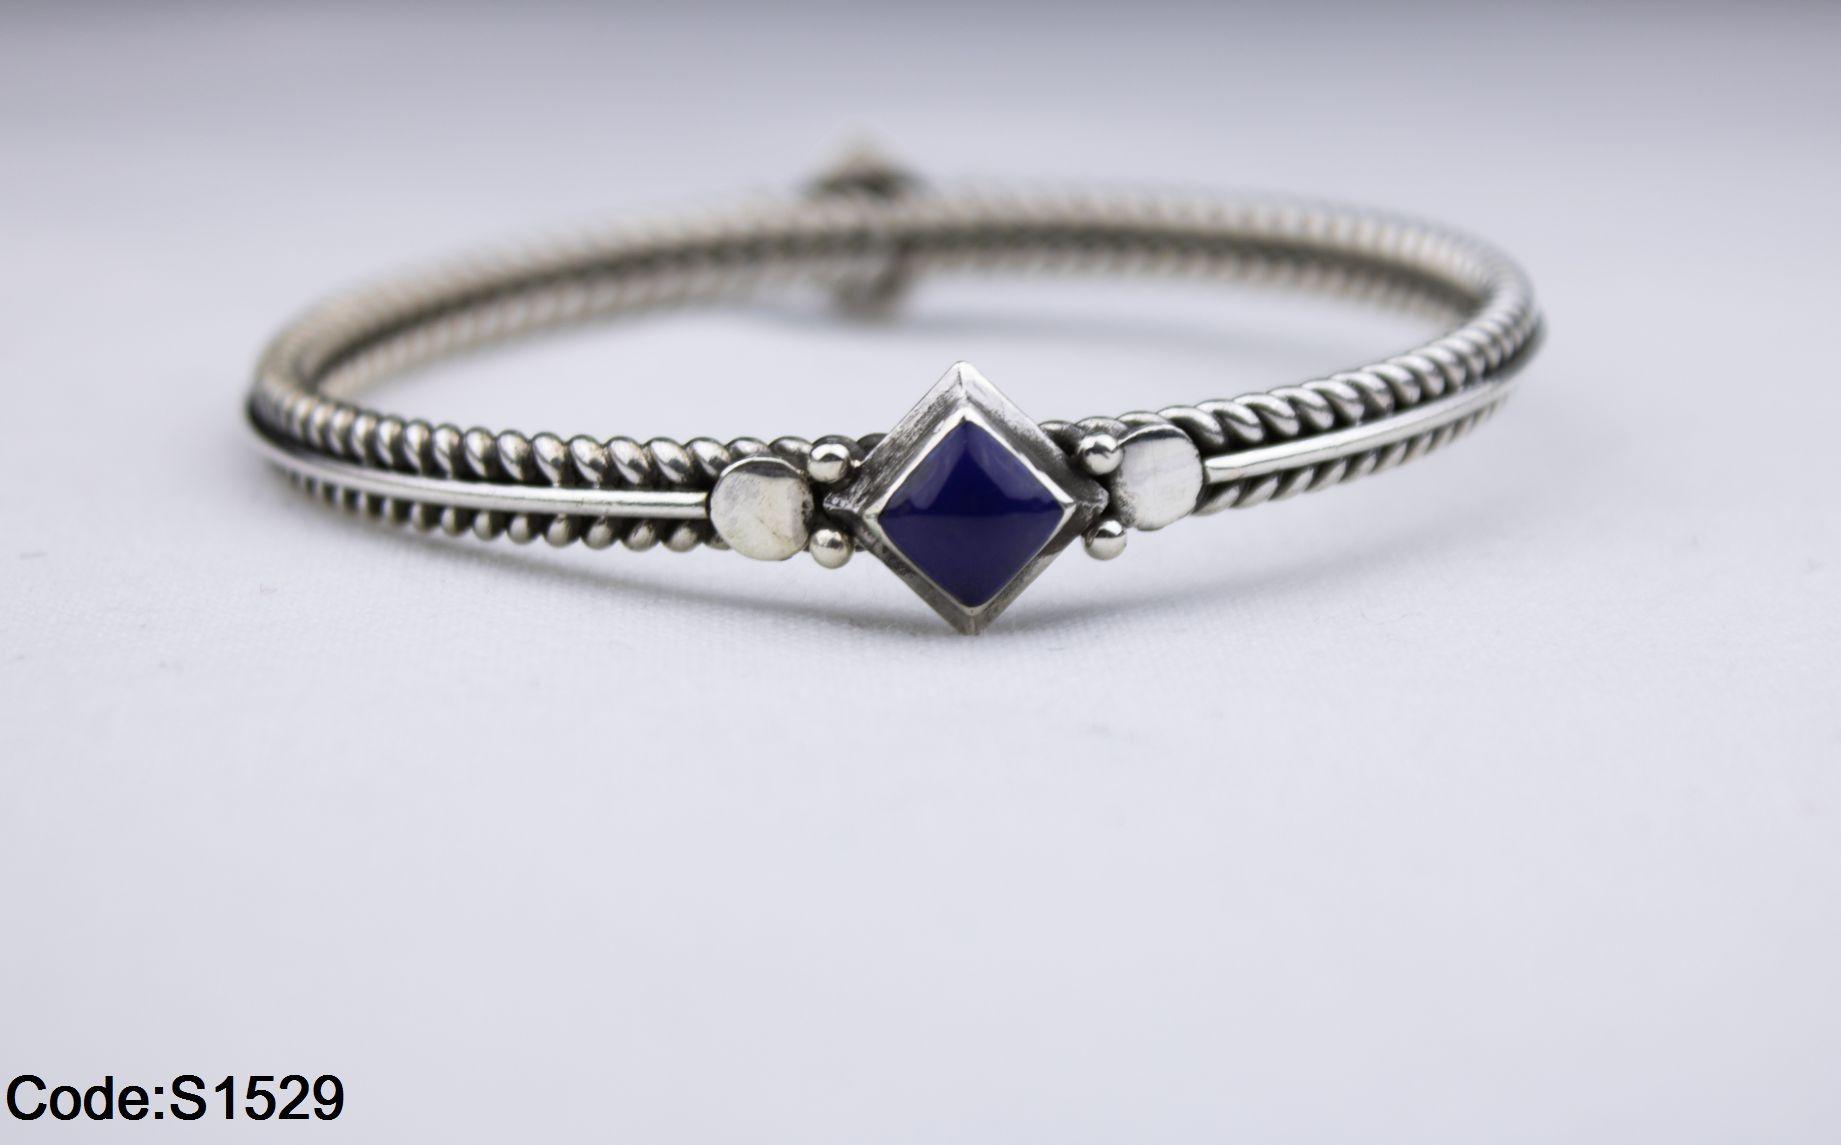 أنسيال مزخرف أزرق بسعر 475ج بدل من 585ج Women Accessories Jewelry Sapphire Ring